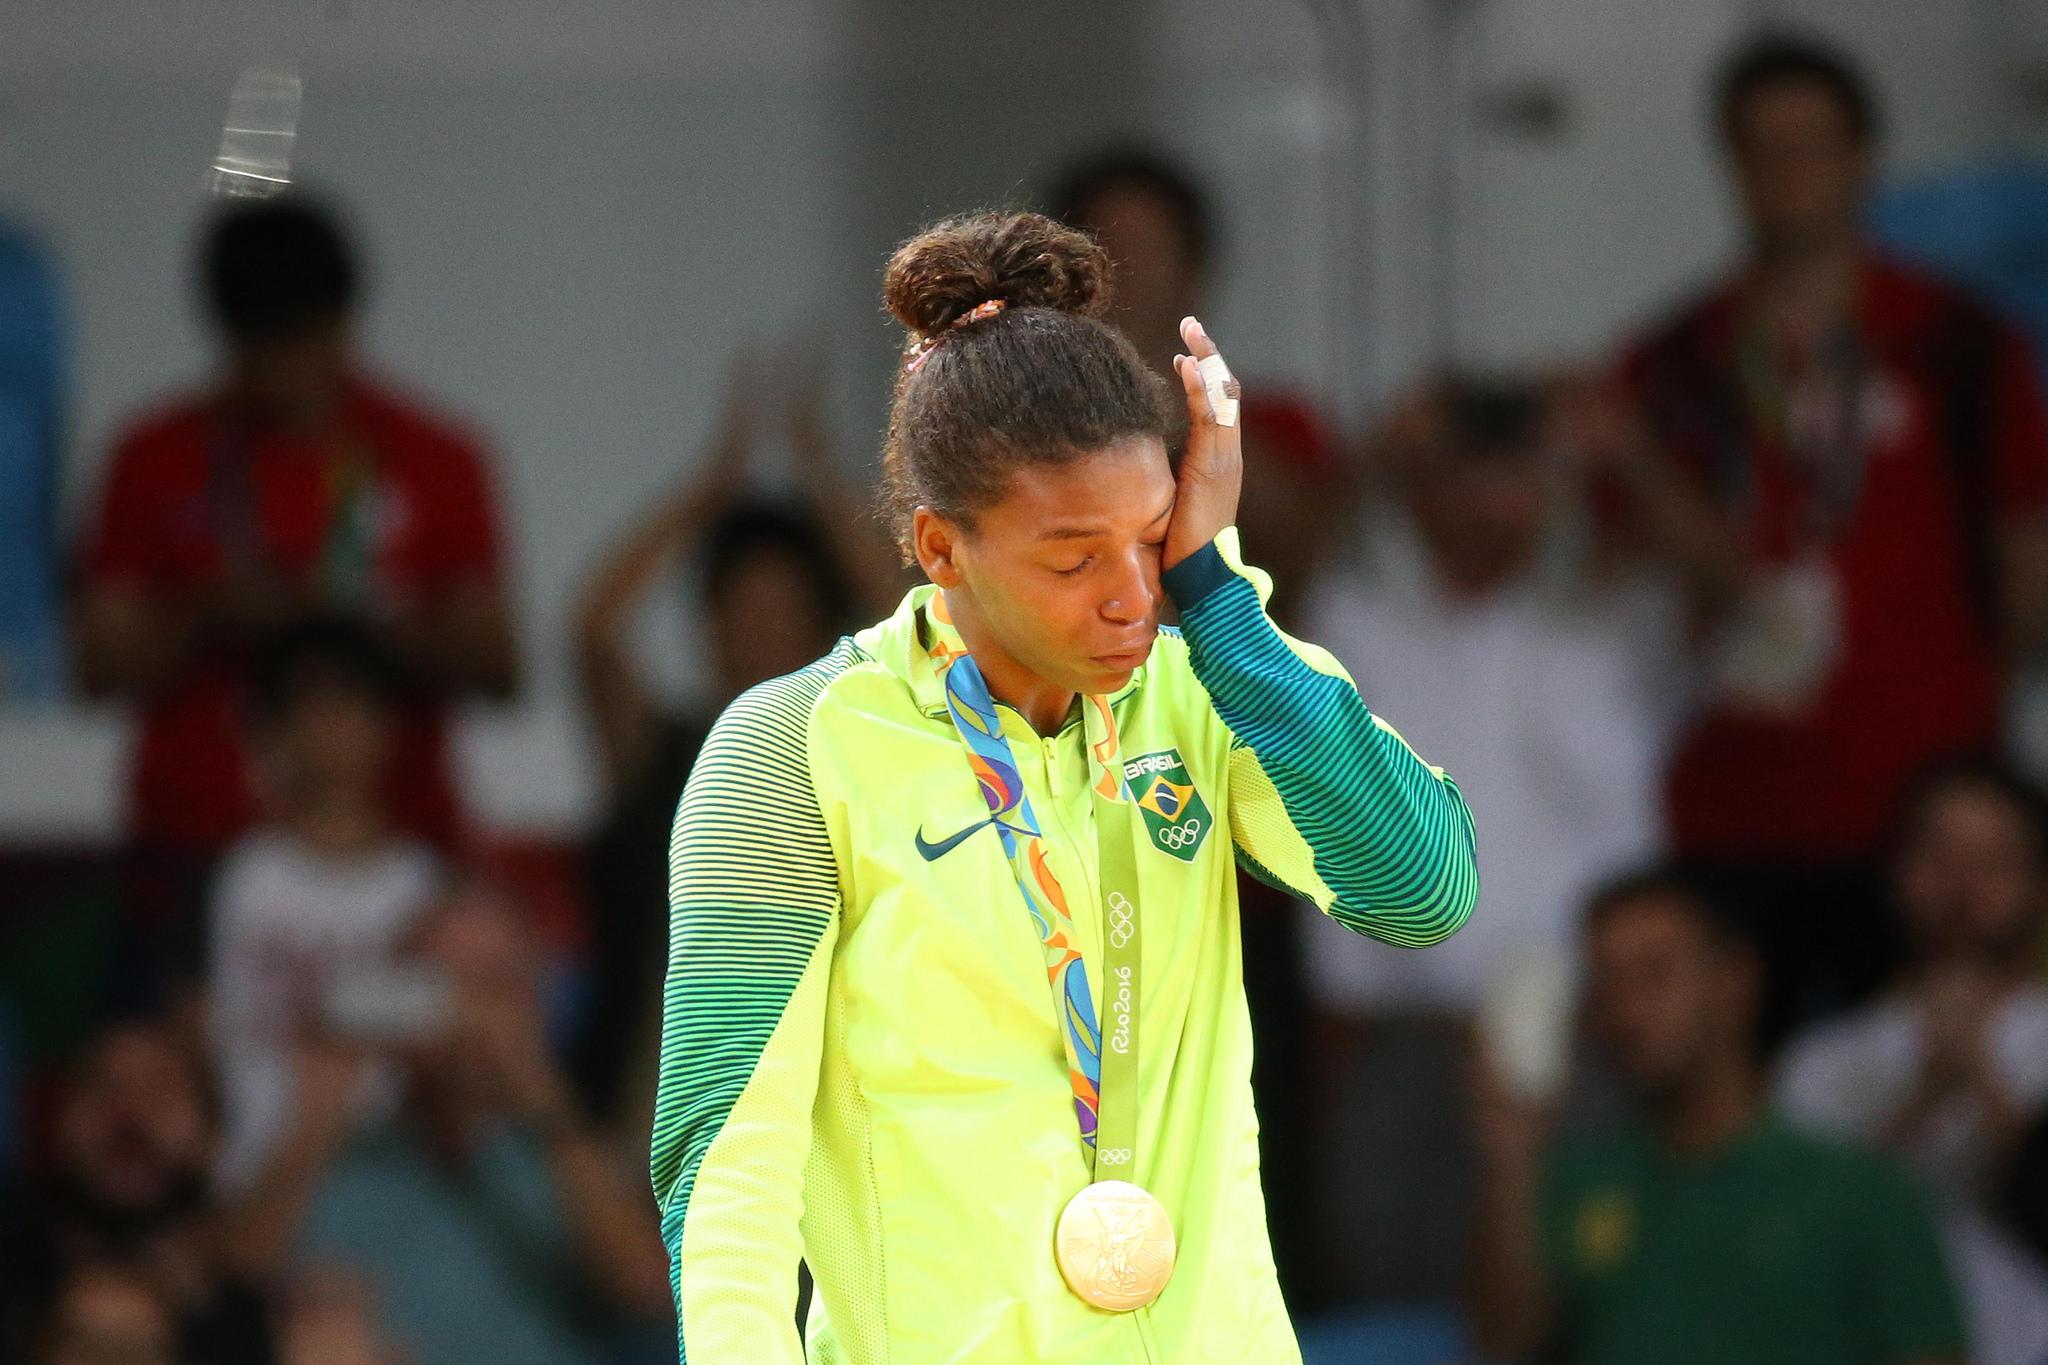 A judoca Rafaela Silva é medalha de ouro nos Jogos Olímpicos Rio 2016 Foto: Roberto Castro/ Brasil2016